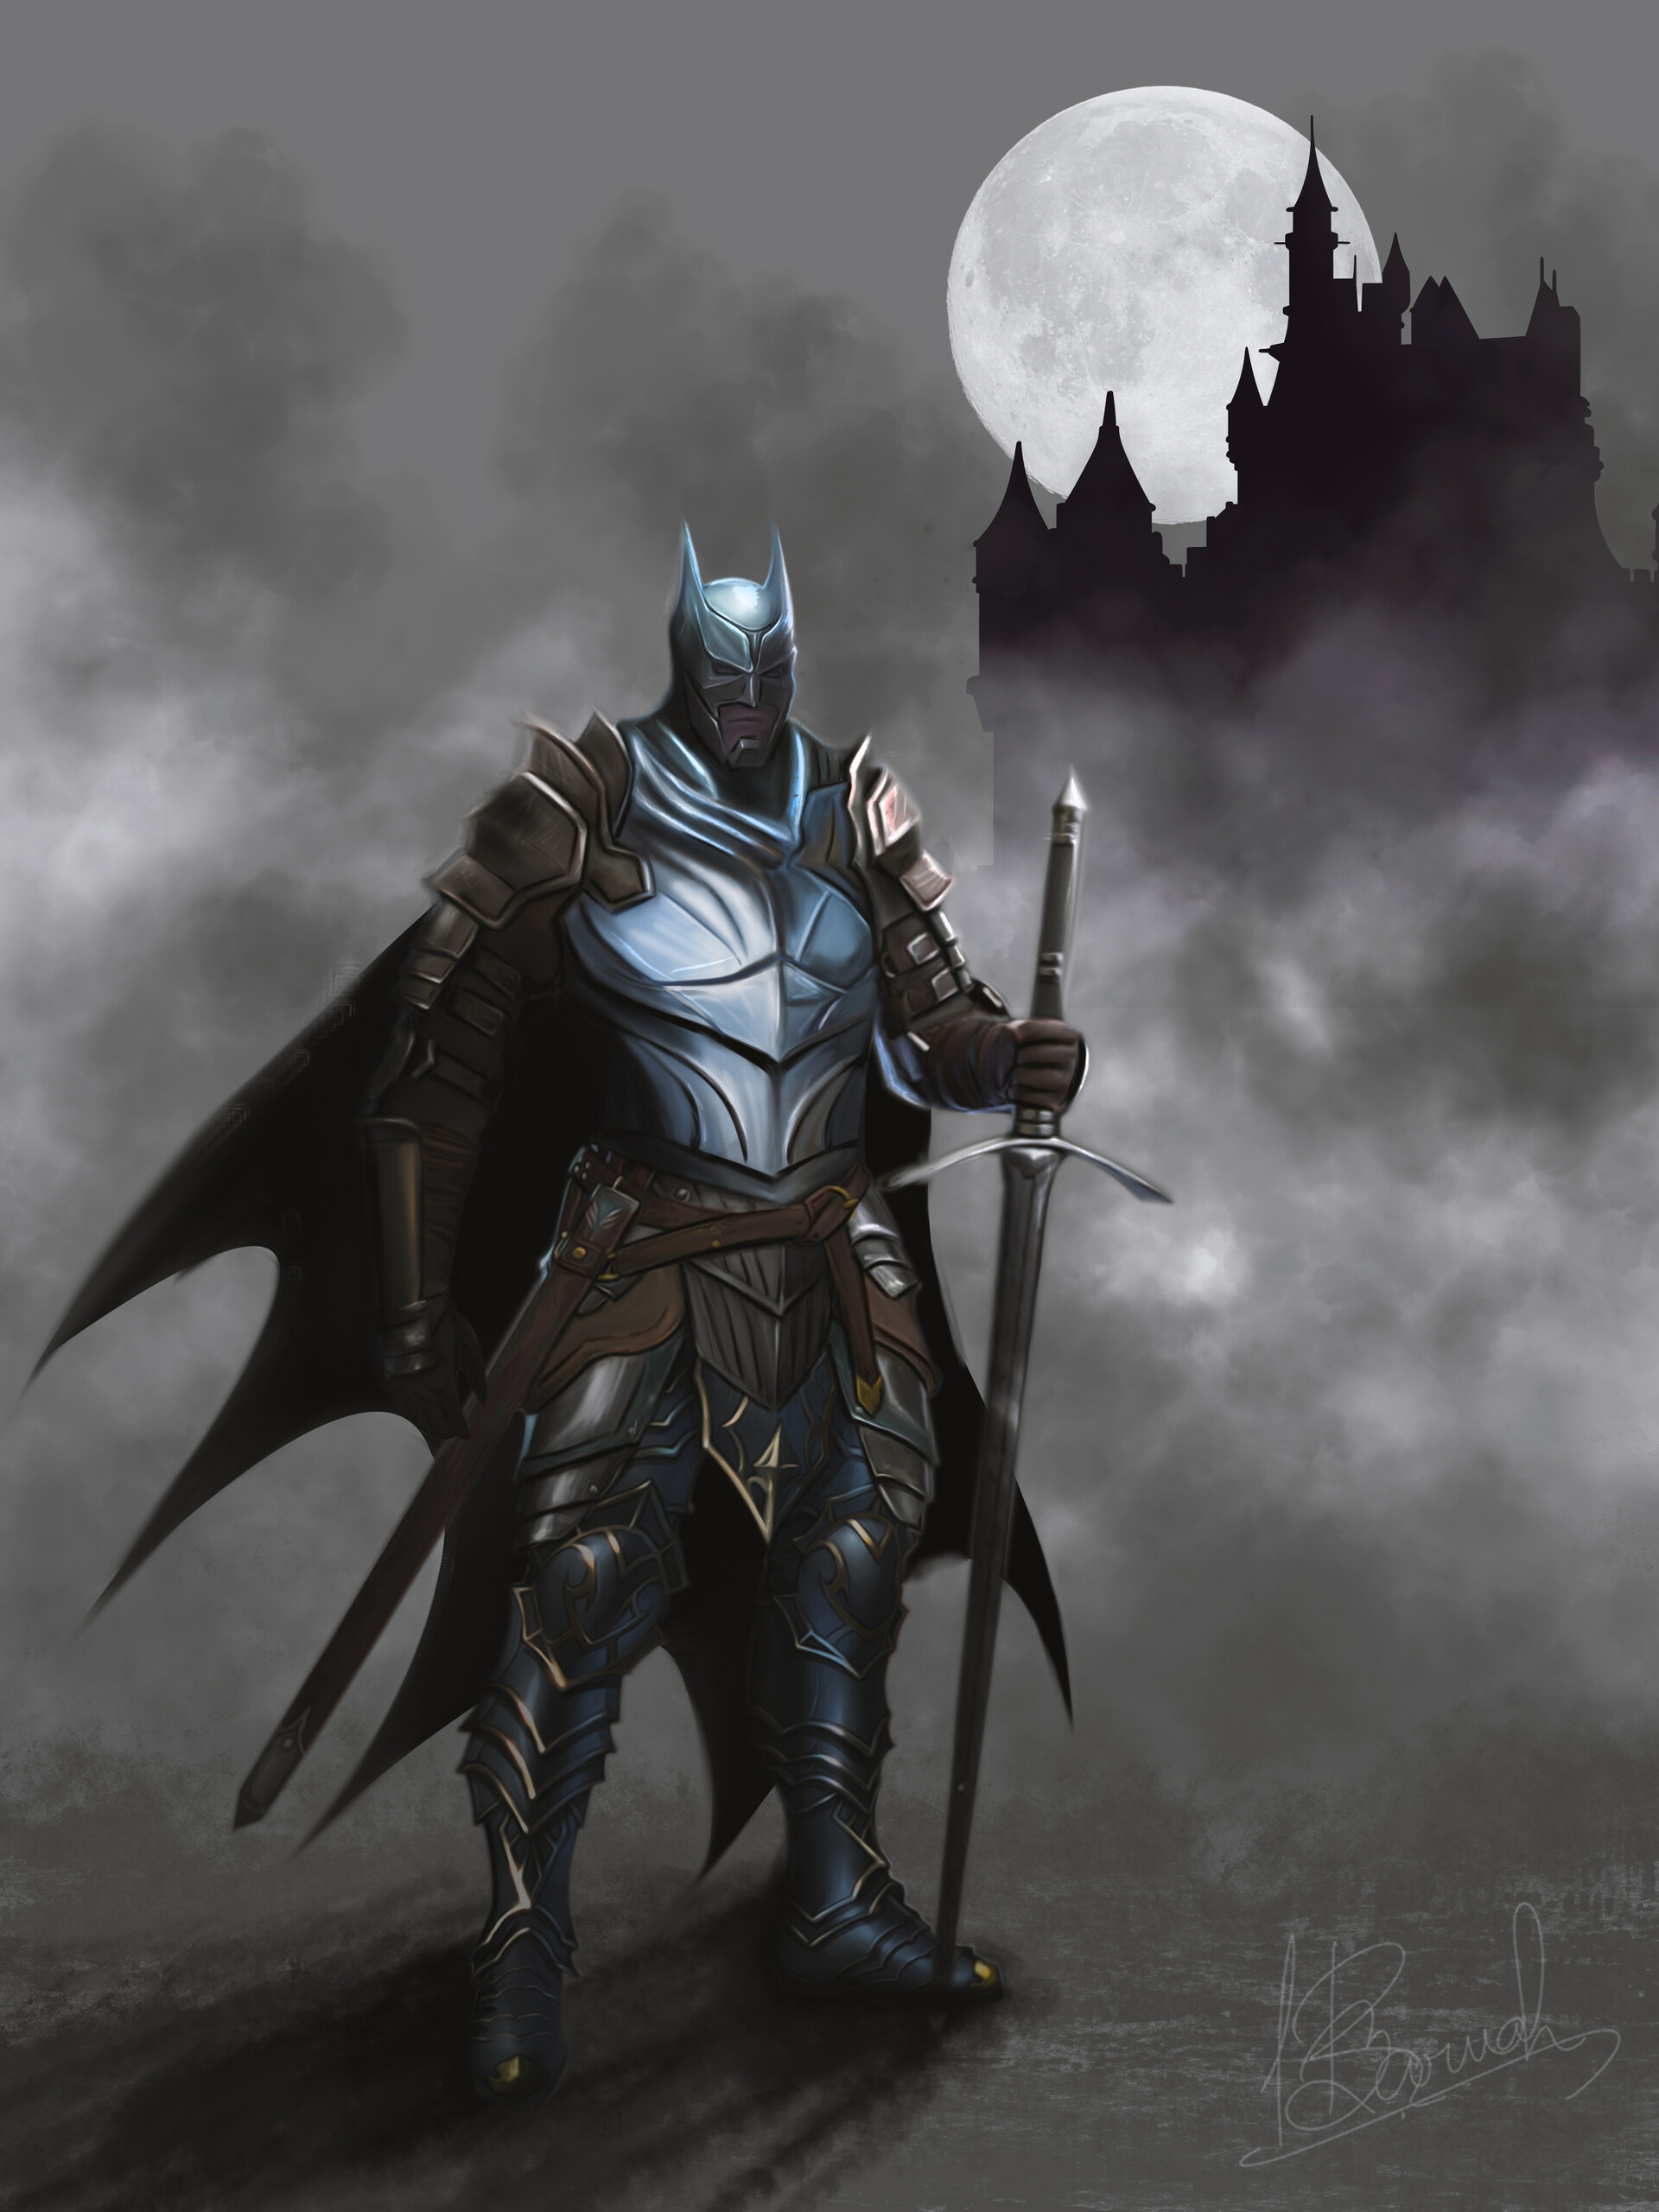 https://cdnb.artstation.com/p/assets/images/images/018/797/809/large/hriday-baruah-dark-knight.jpg